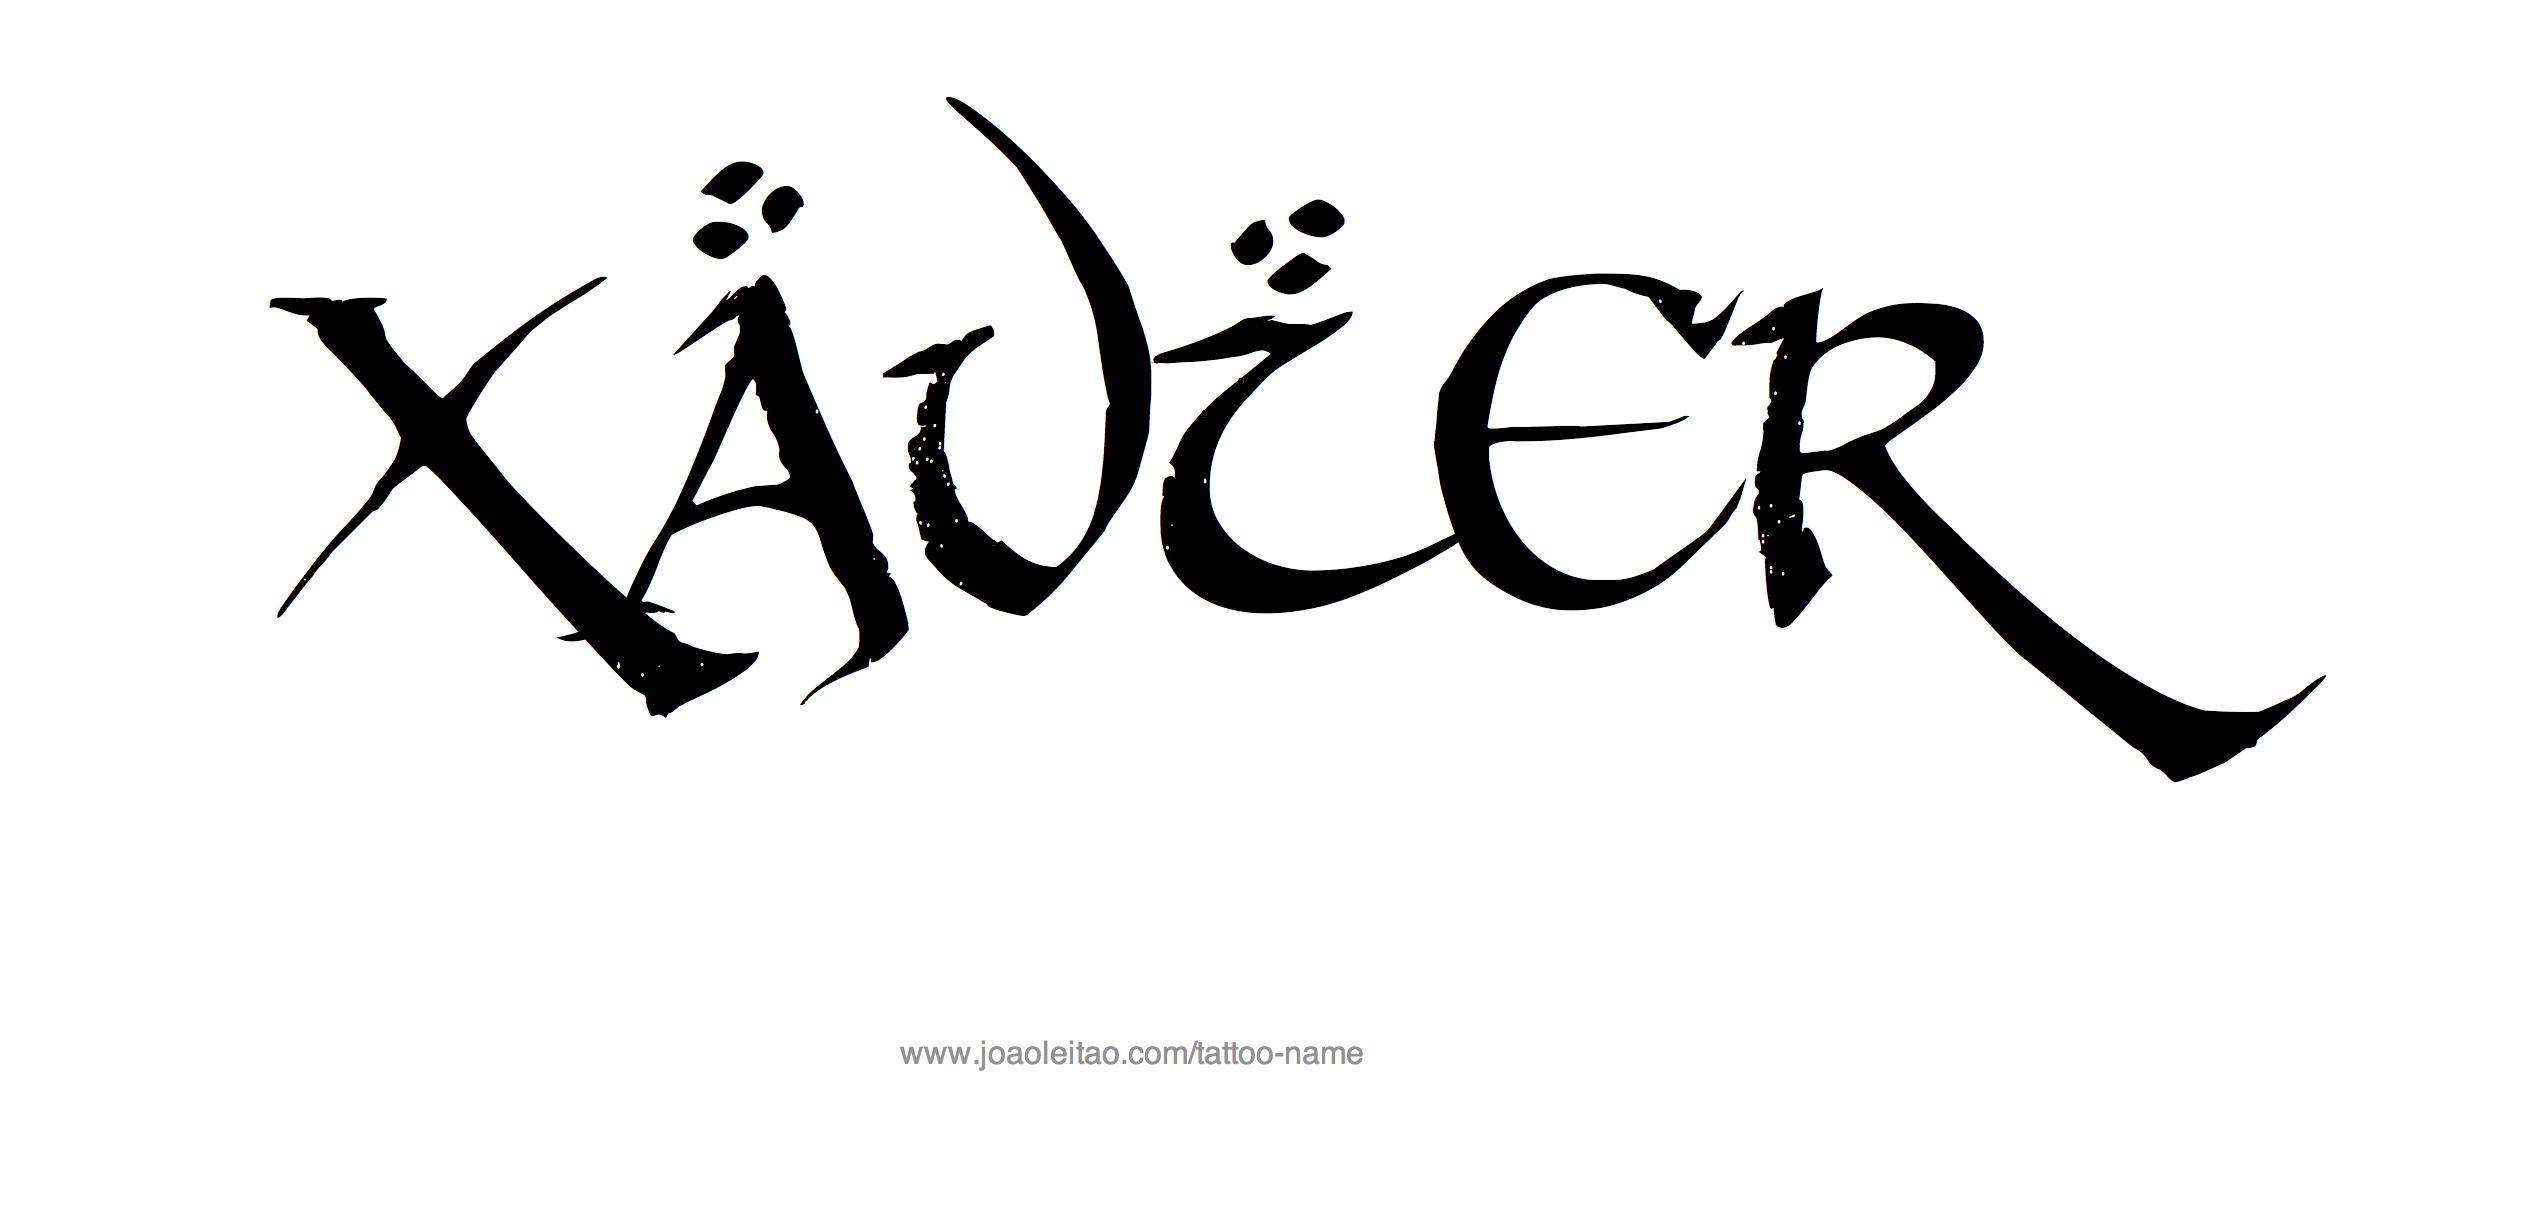 Xavier Name Tattoo Designs